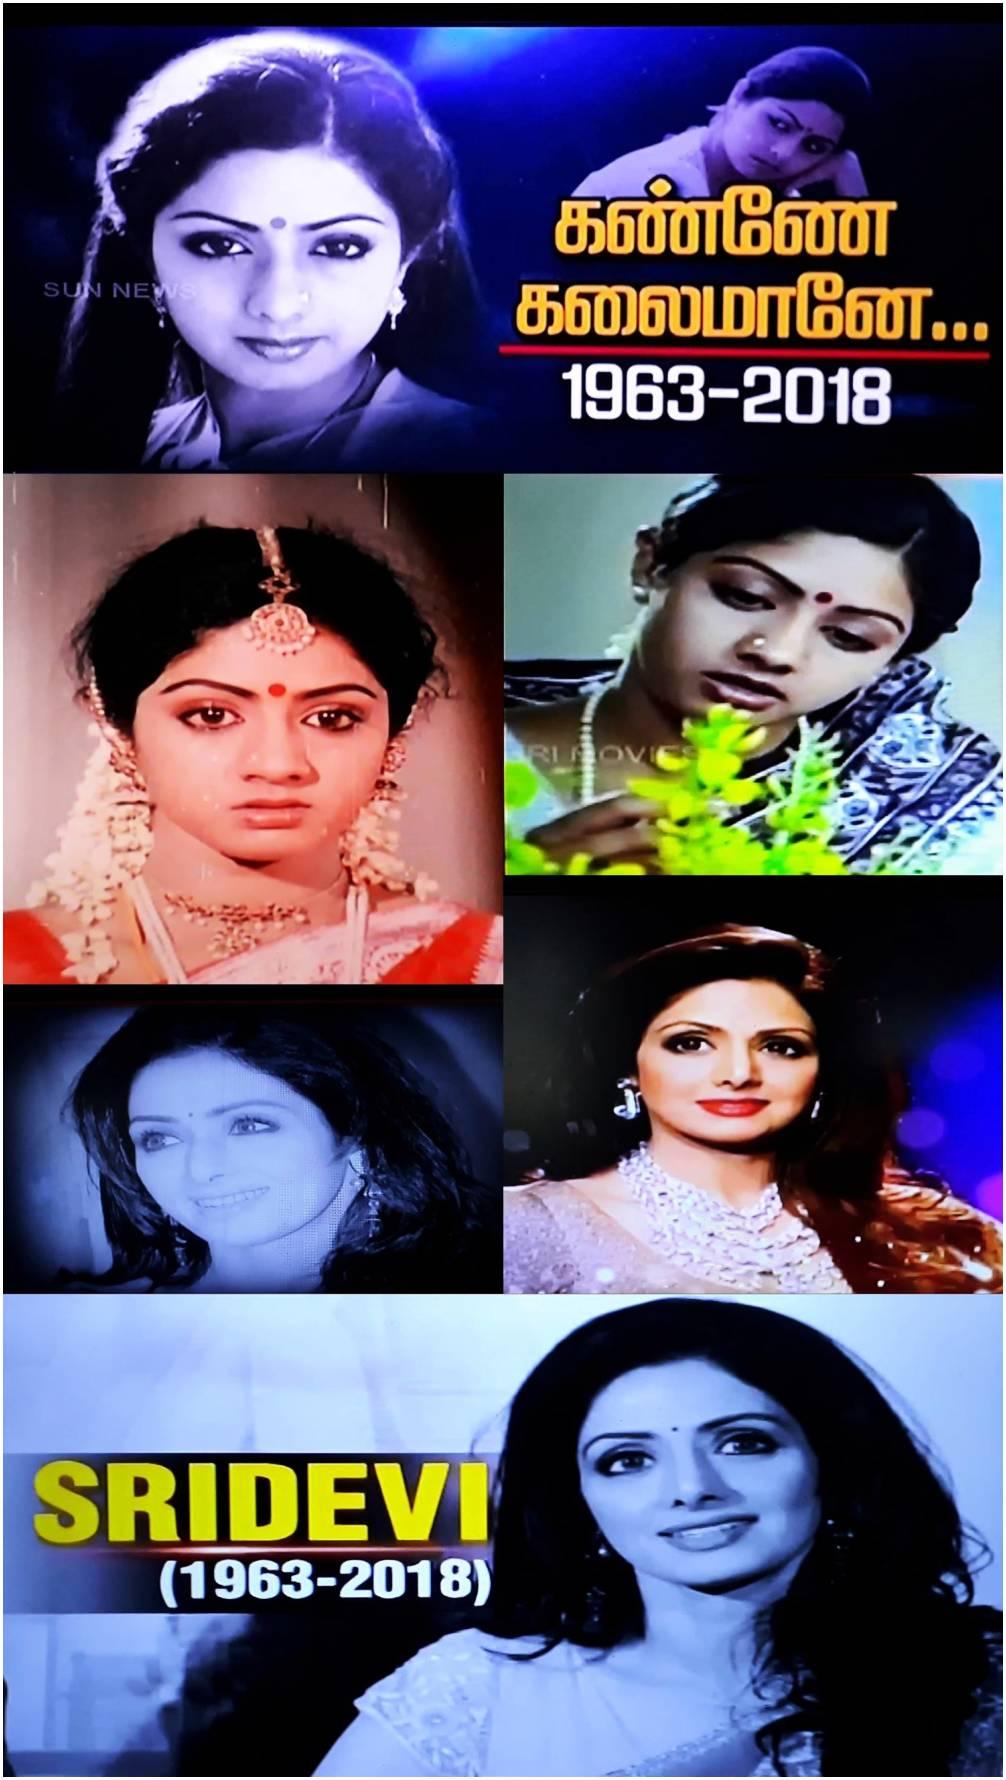 Farewell Sridevi